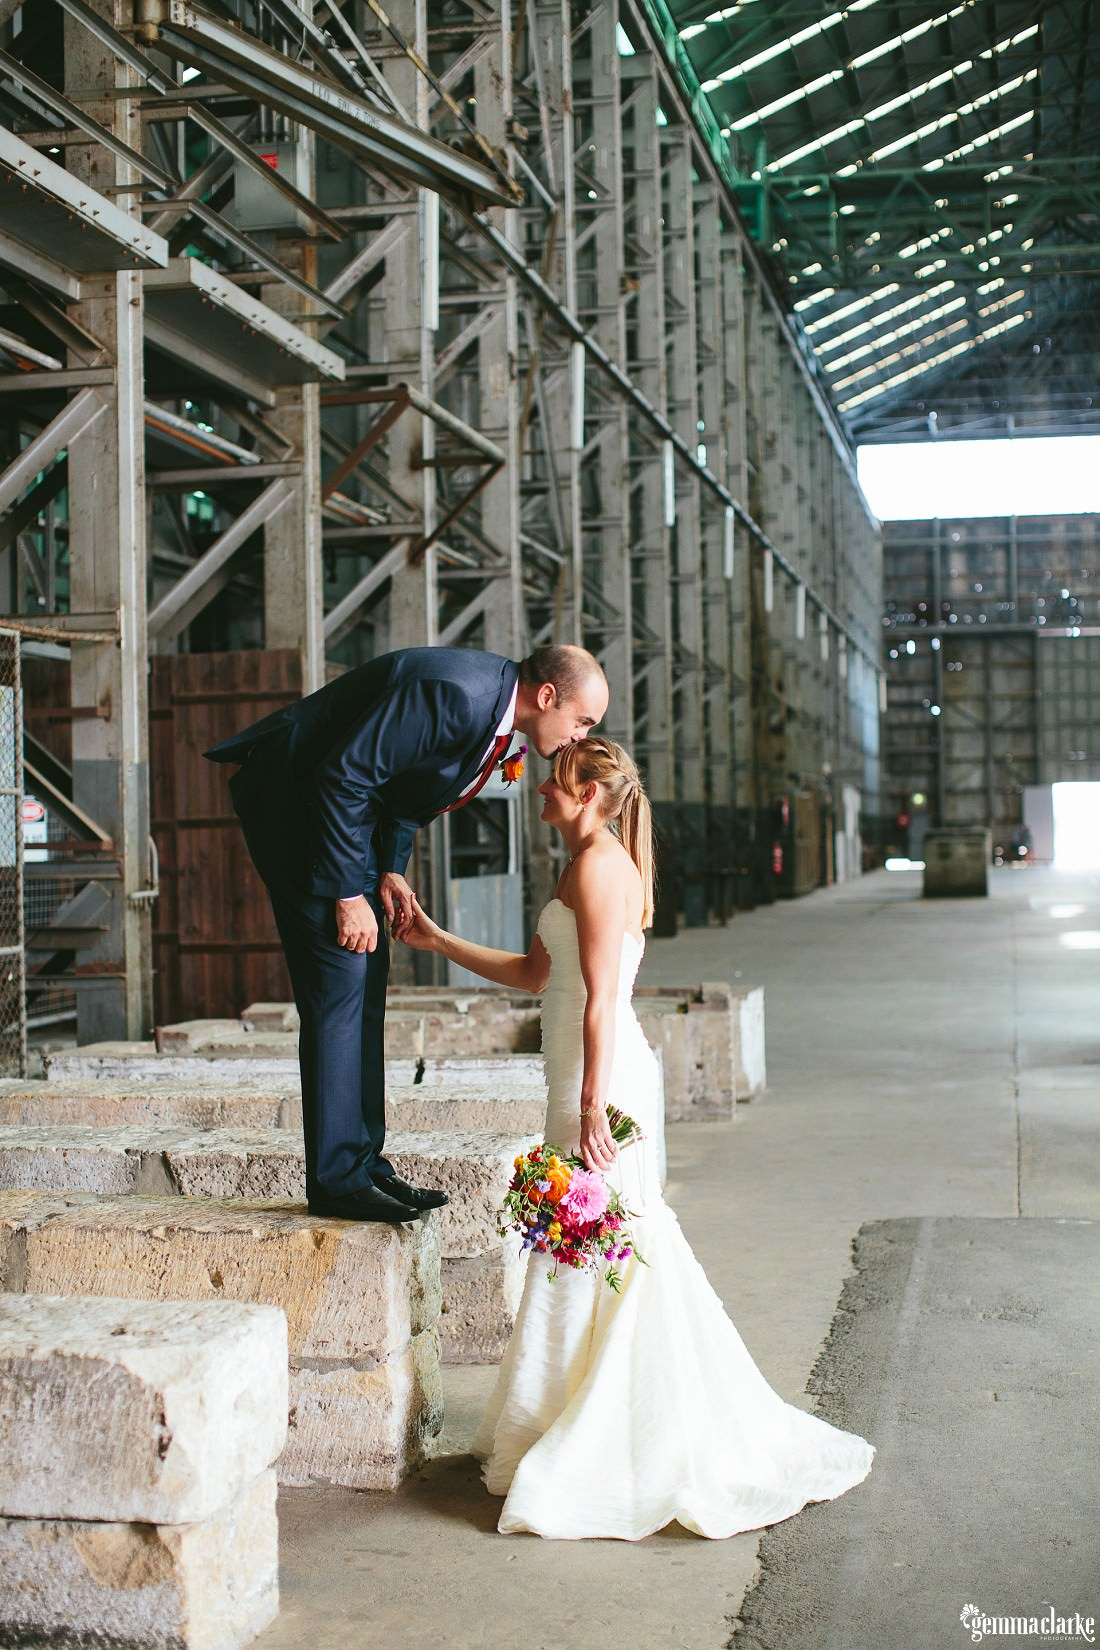 gemmaclarkephotography_cockatoo-island-wedding-photos_the-bar-at-the-end-of-the-wharf_0043